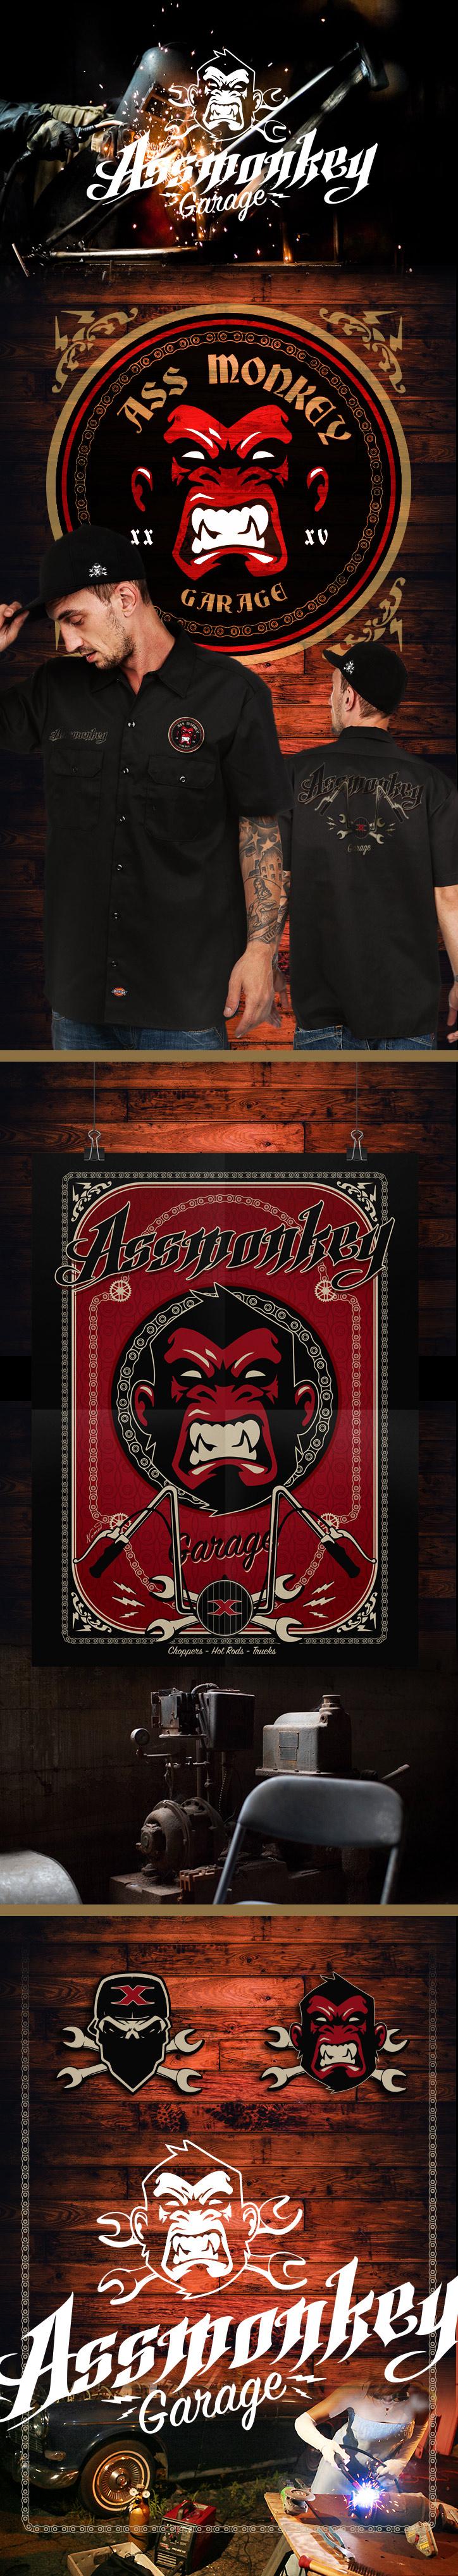 Assmonkey Garage